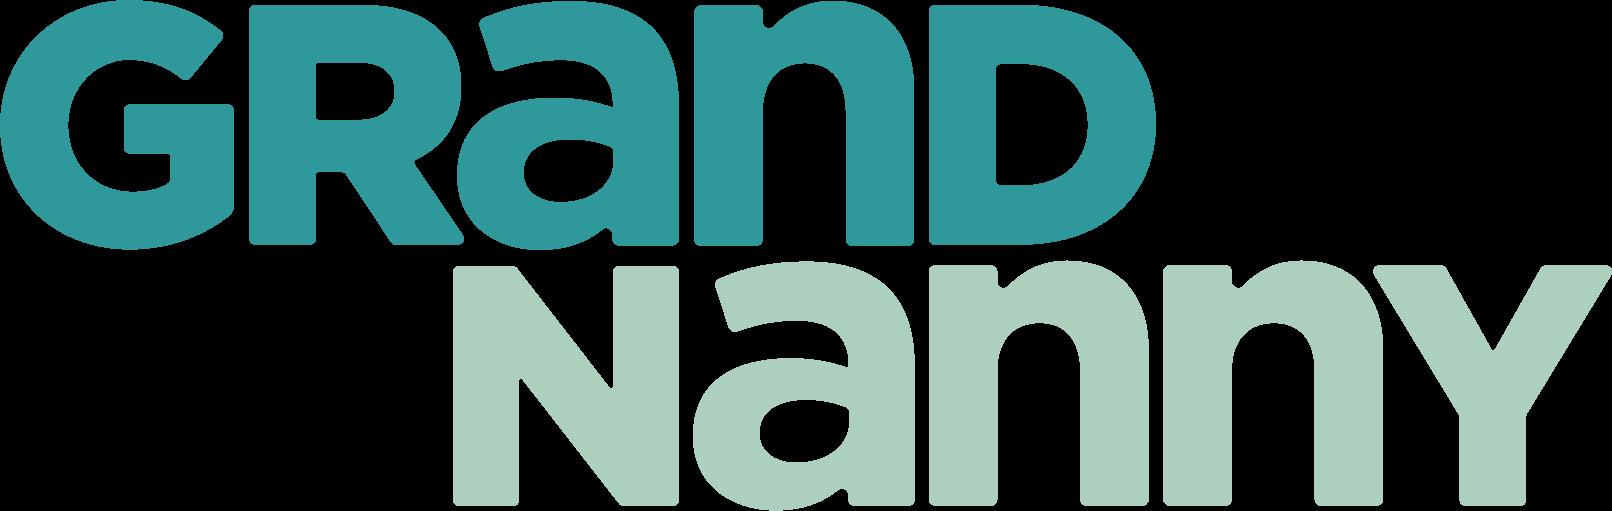 Grandnanny teal logo